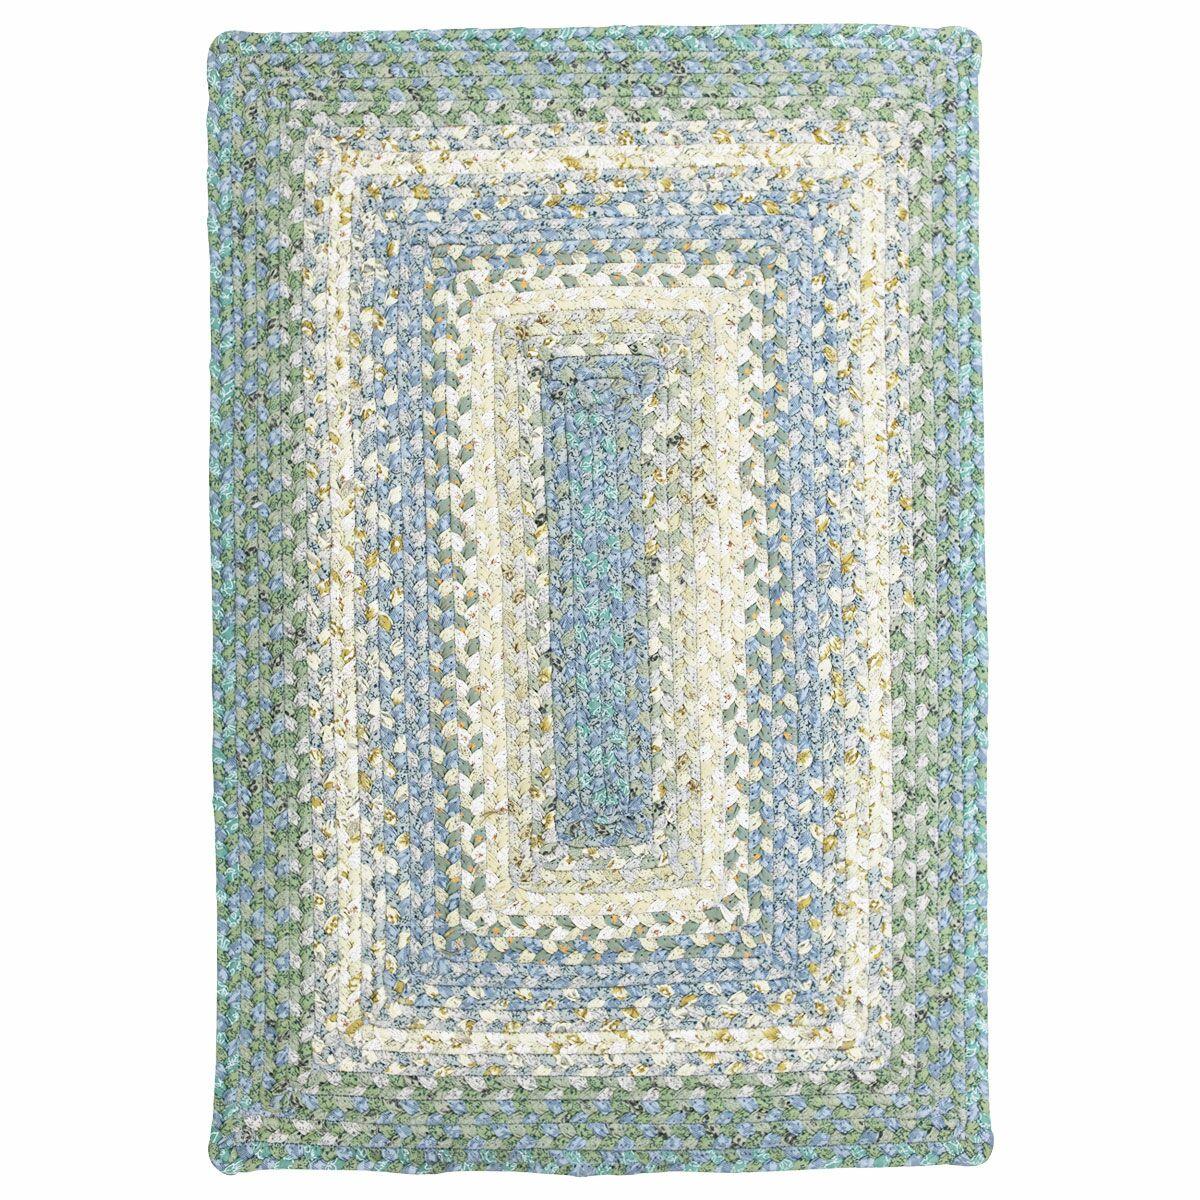 Cotton Braided Baja Blue Area Rug Rug Size: Rectangle 8' x 10'